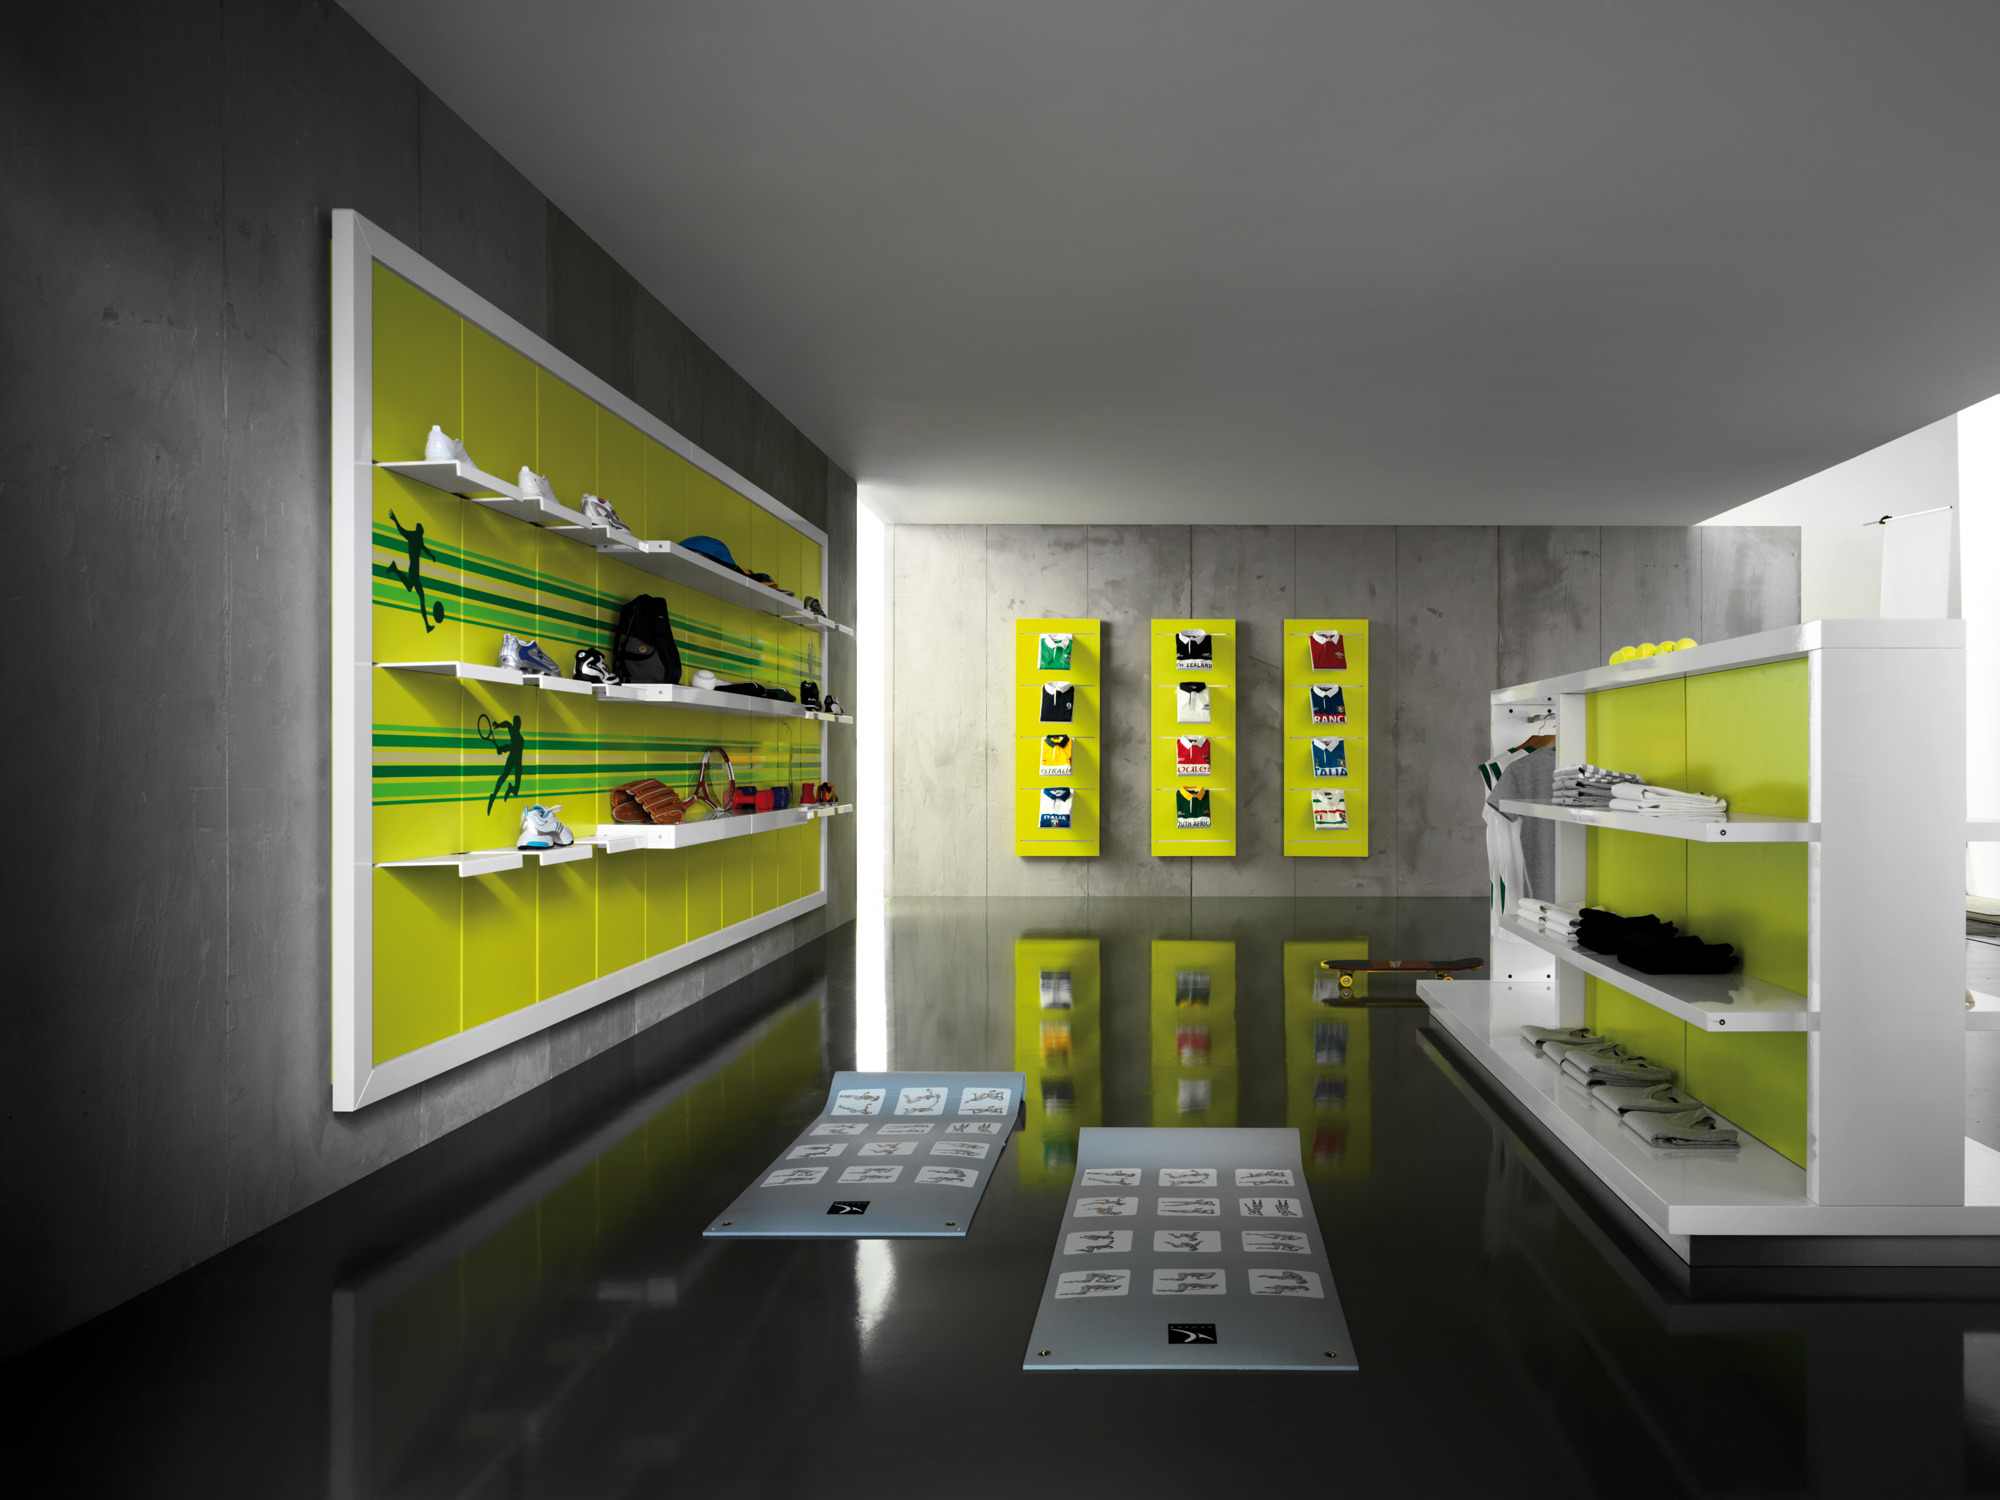 Arredamento per negozio di calzature toscana belardi for Negozi arredamento economici